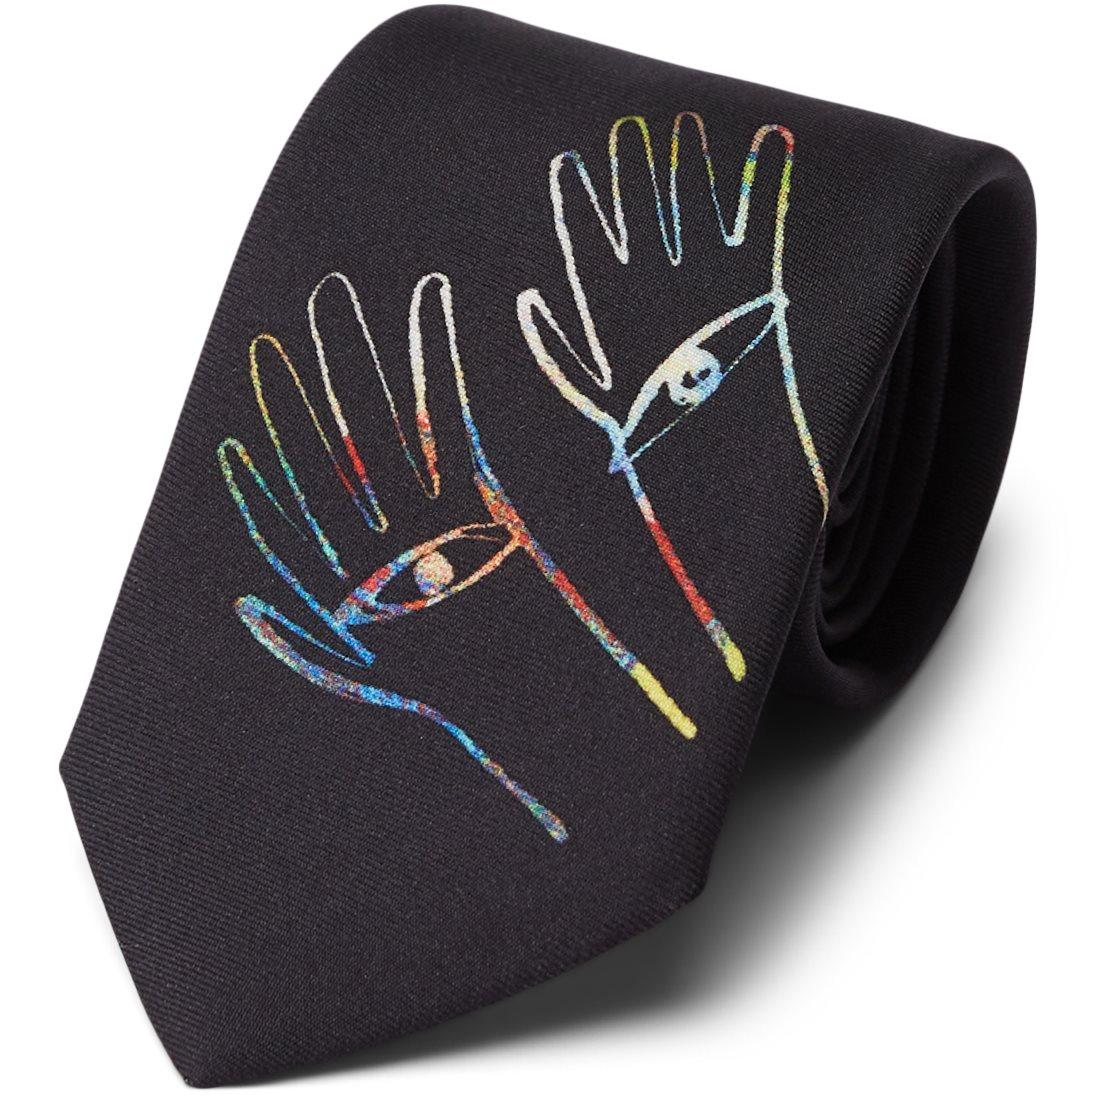 Dream Tie - Slips - Sort